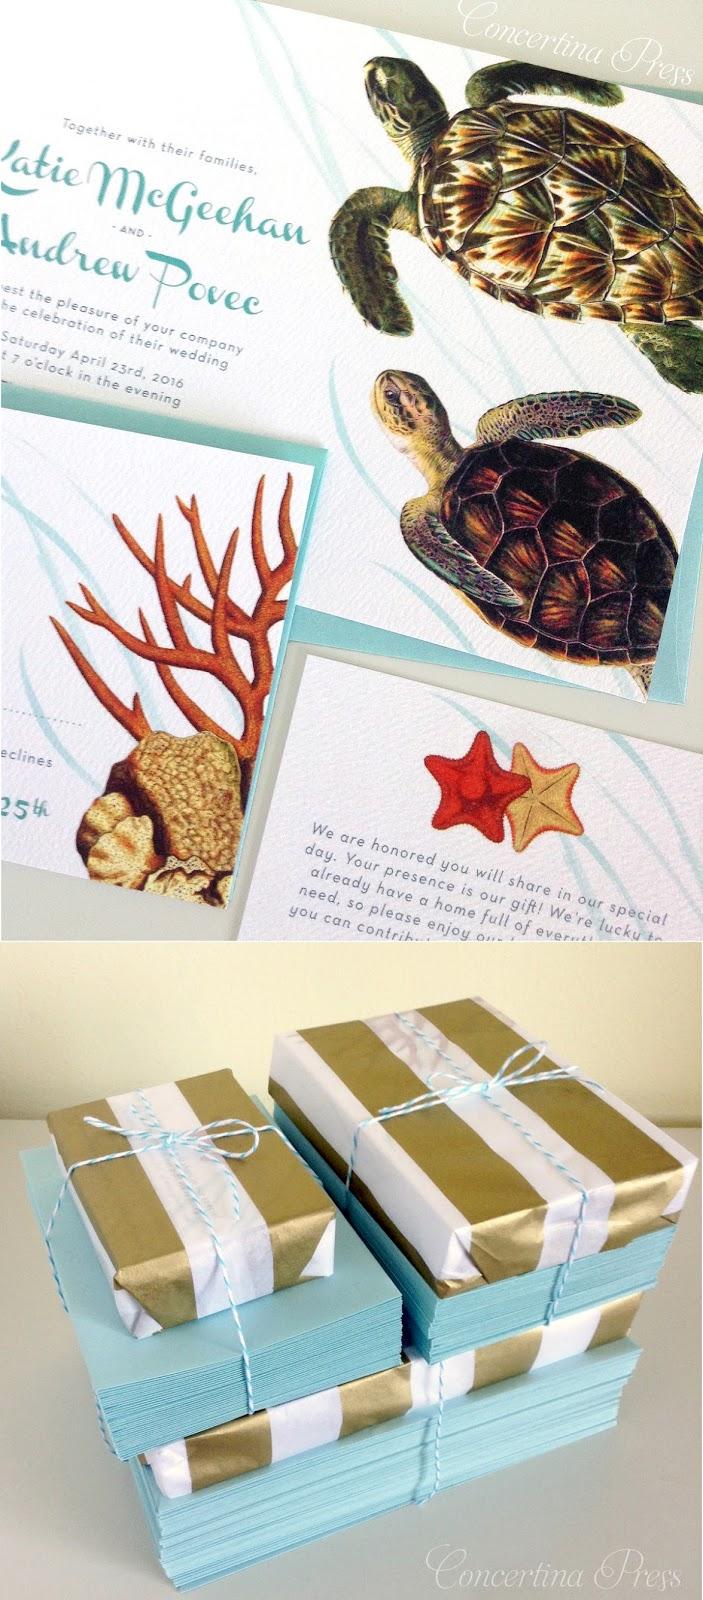 Sea Turtle Beach Wedding Invitations from Concertina Press